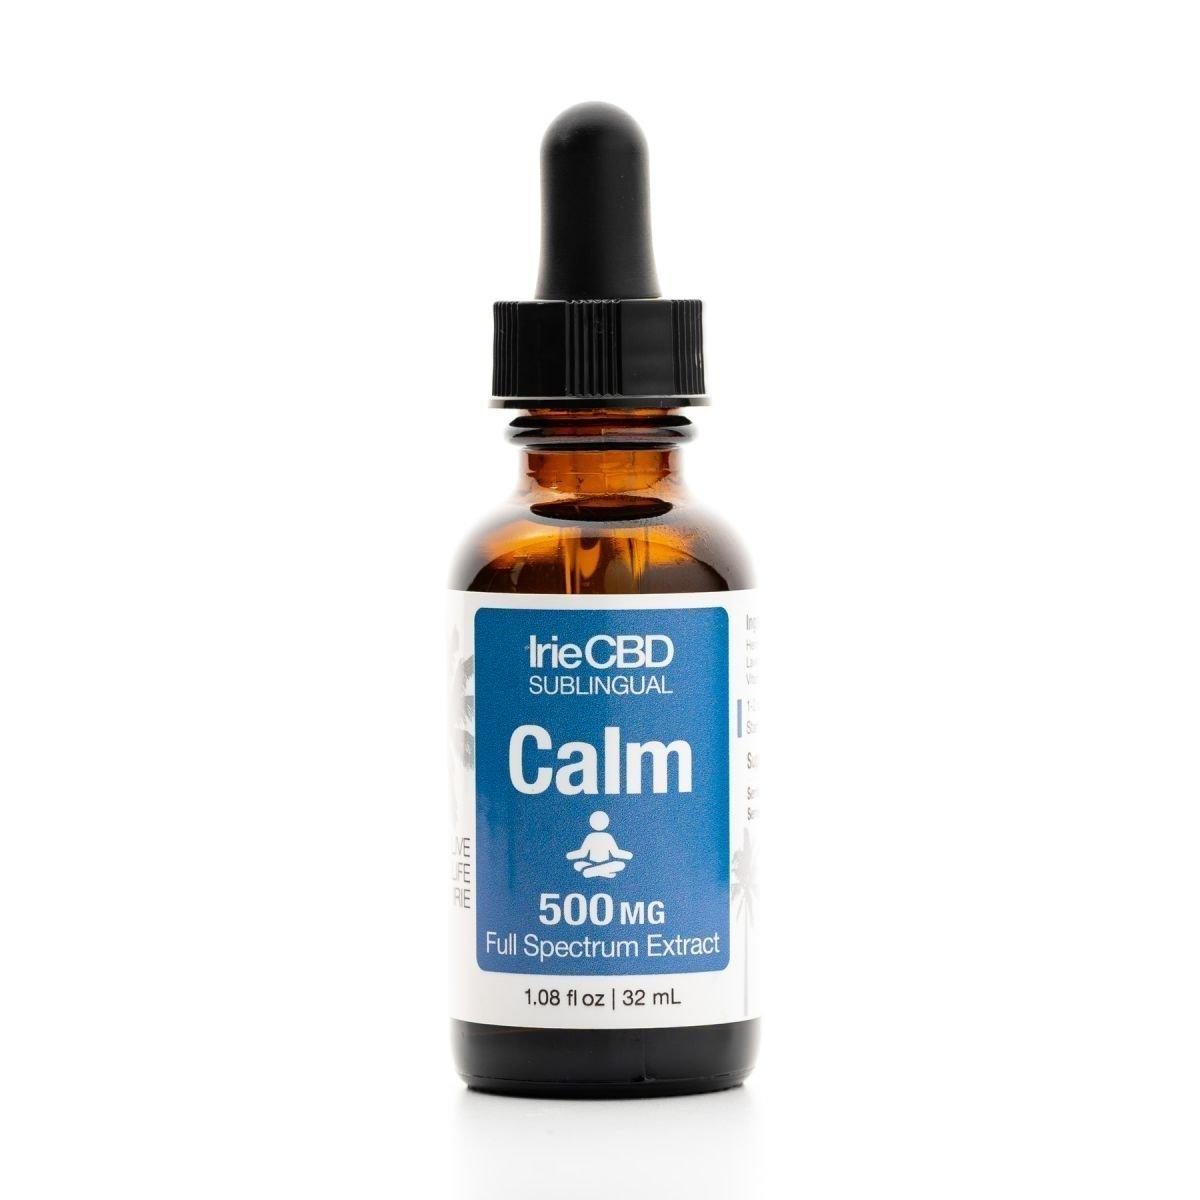 IrieCBD Calm CBD Oil Tincture